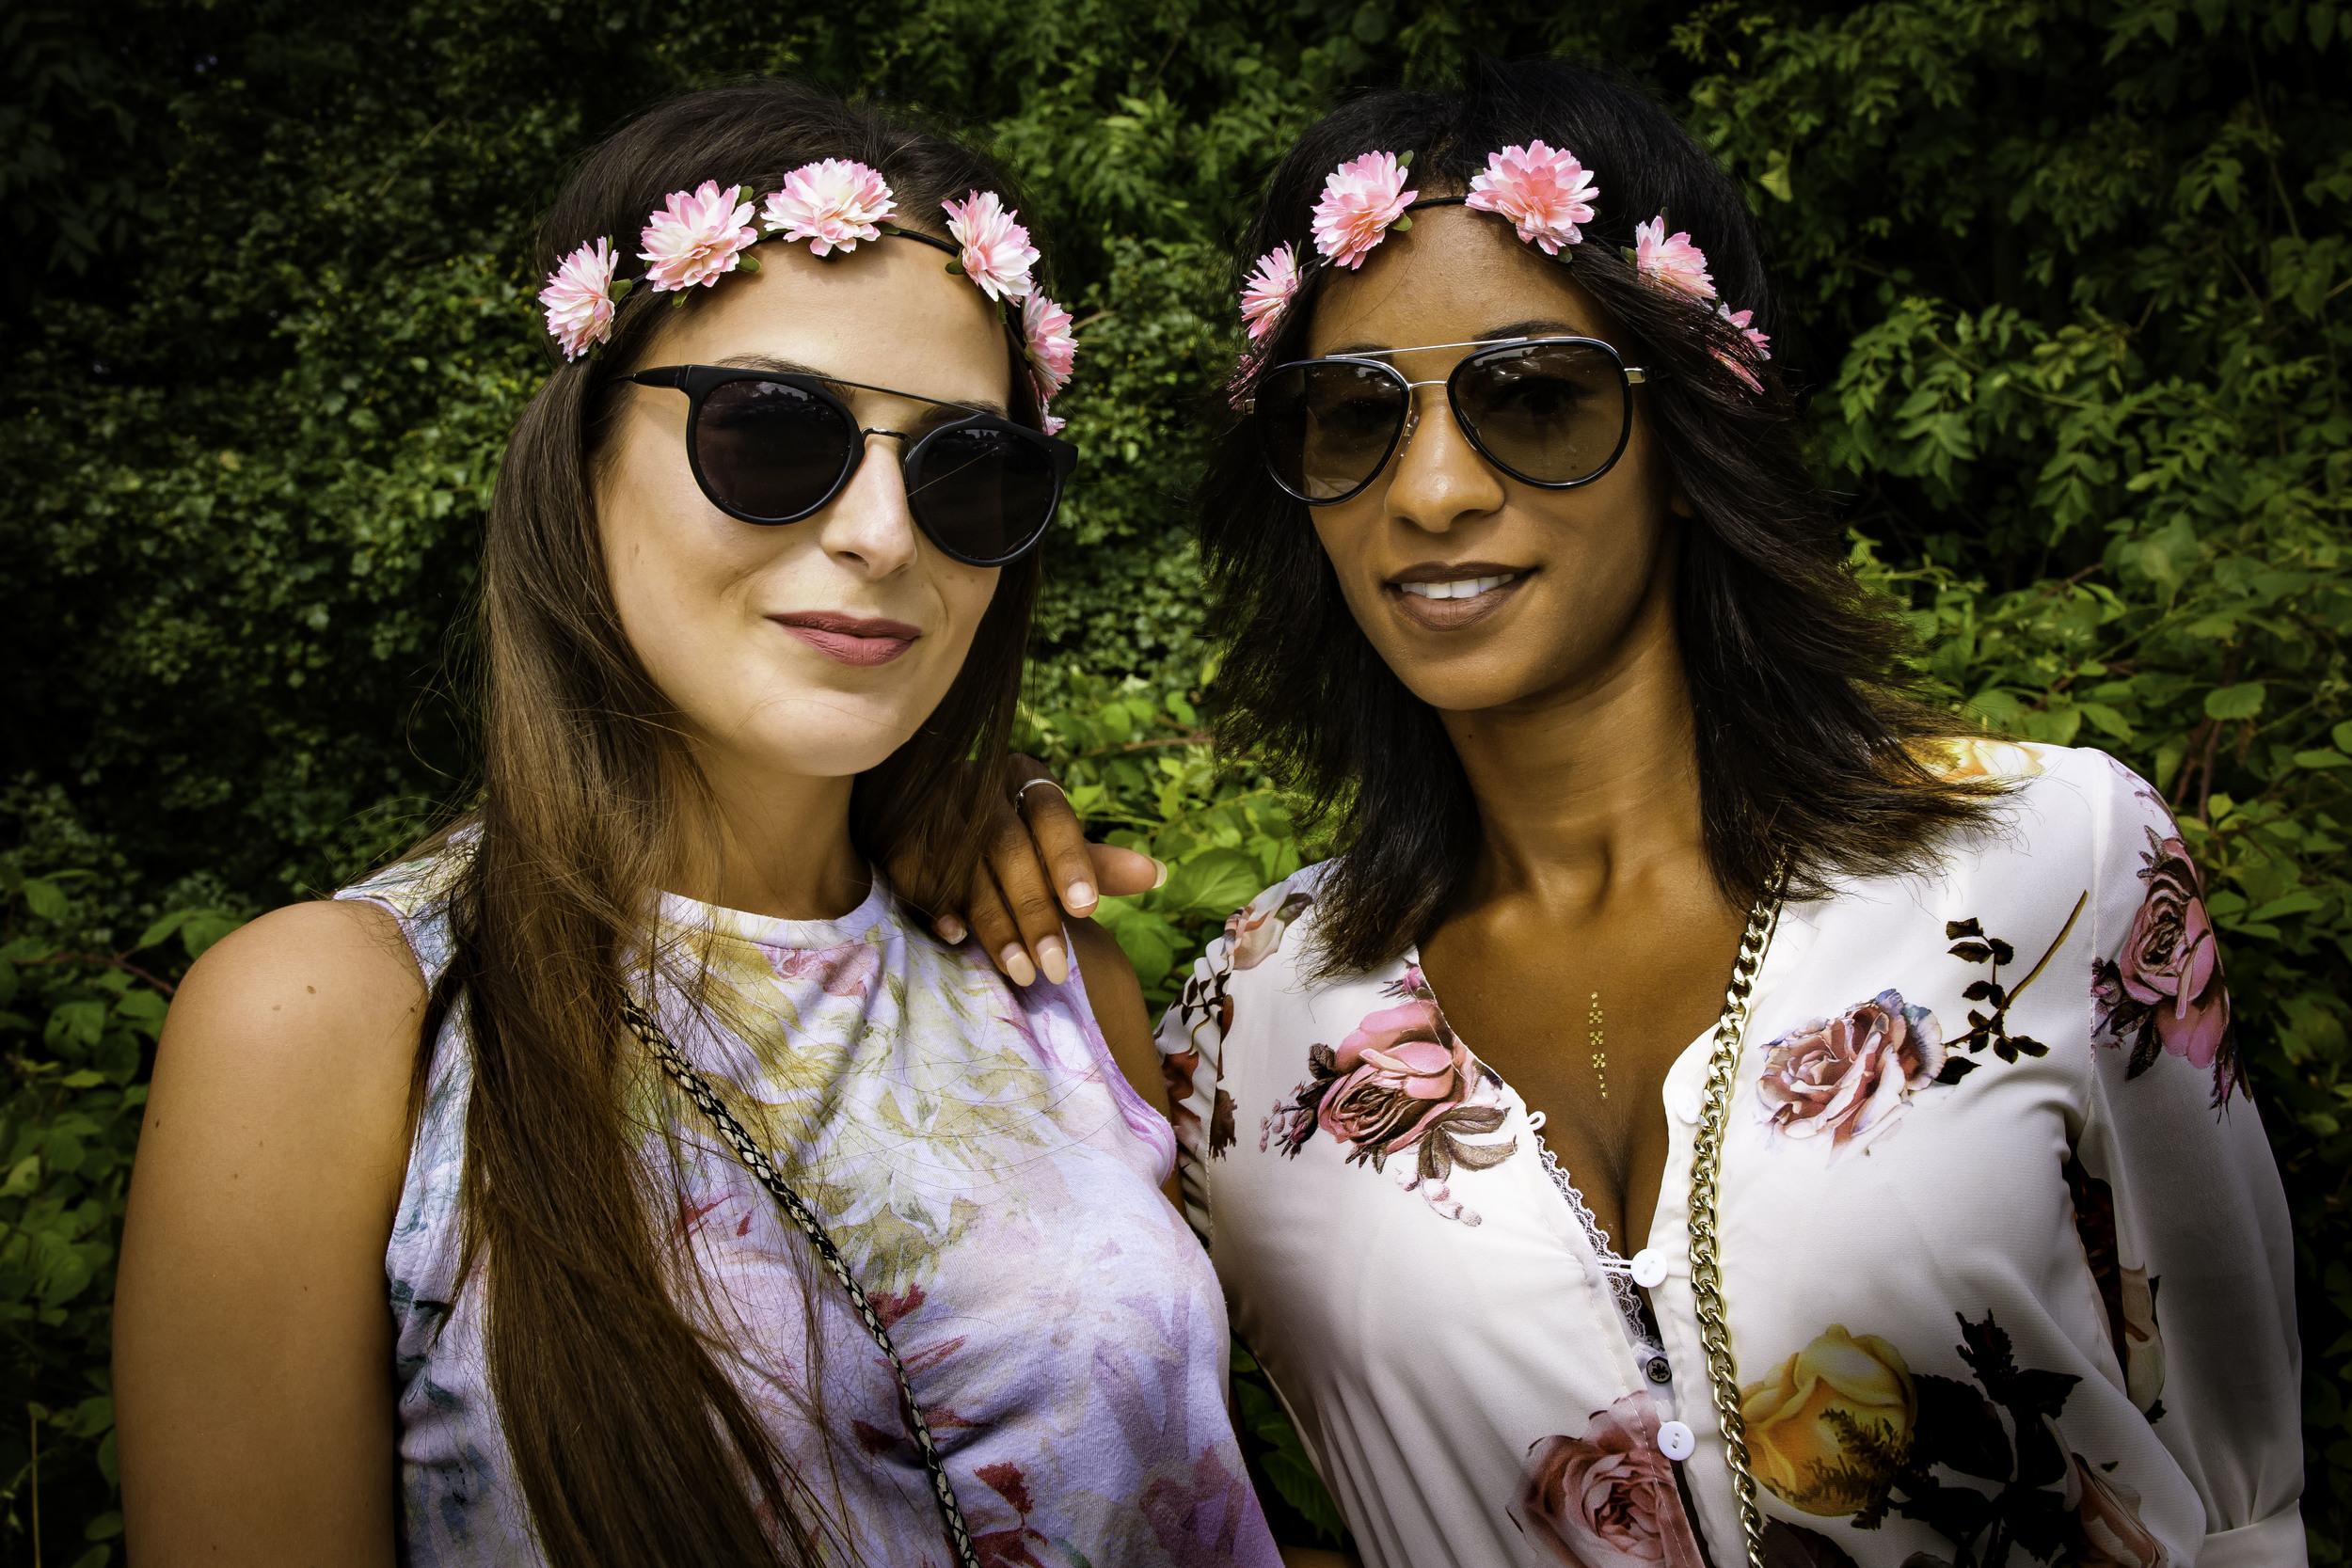 viewfinder-geen-eigenzinnige-fotografie-wel-snapshots-tomorrowland-themadness-2016-flowergirls-parking-france-francais-no-english